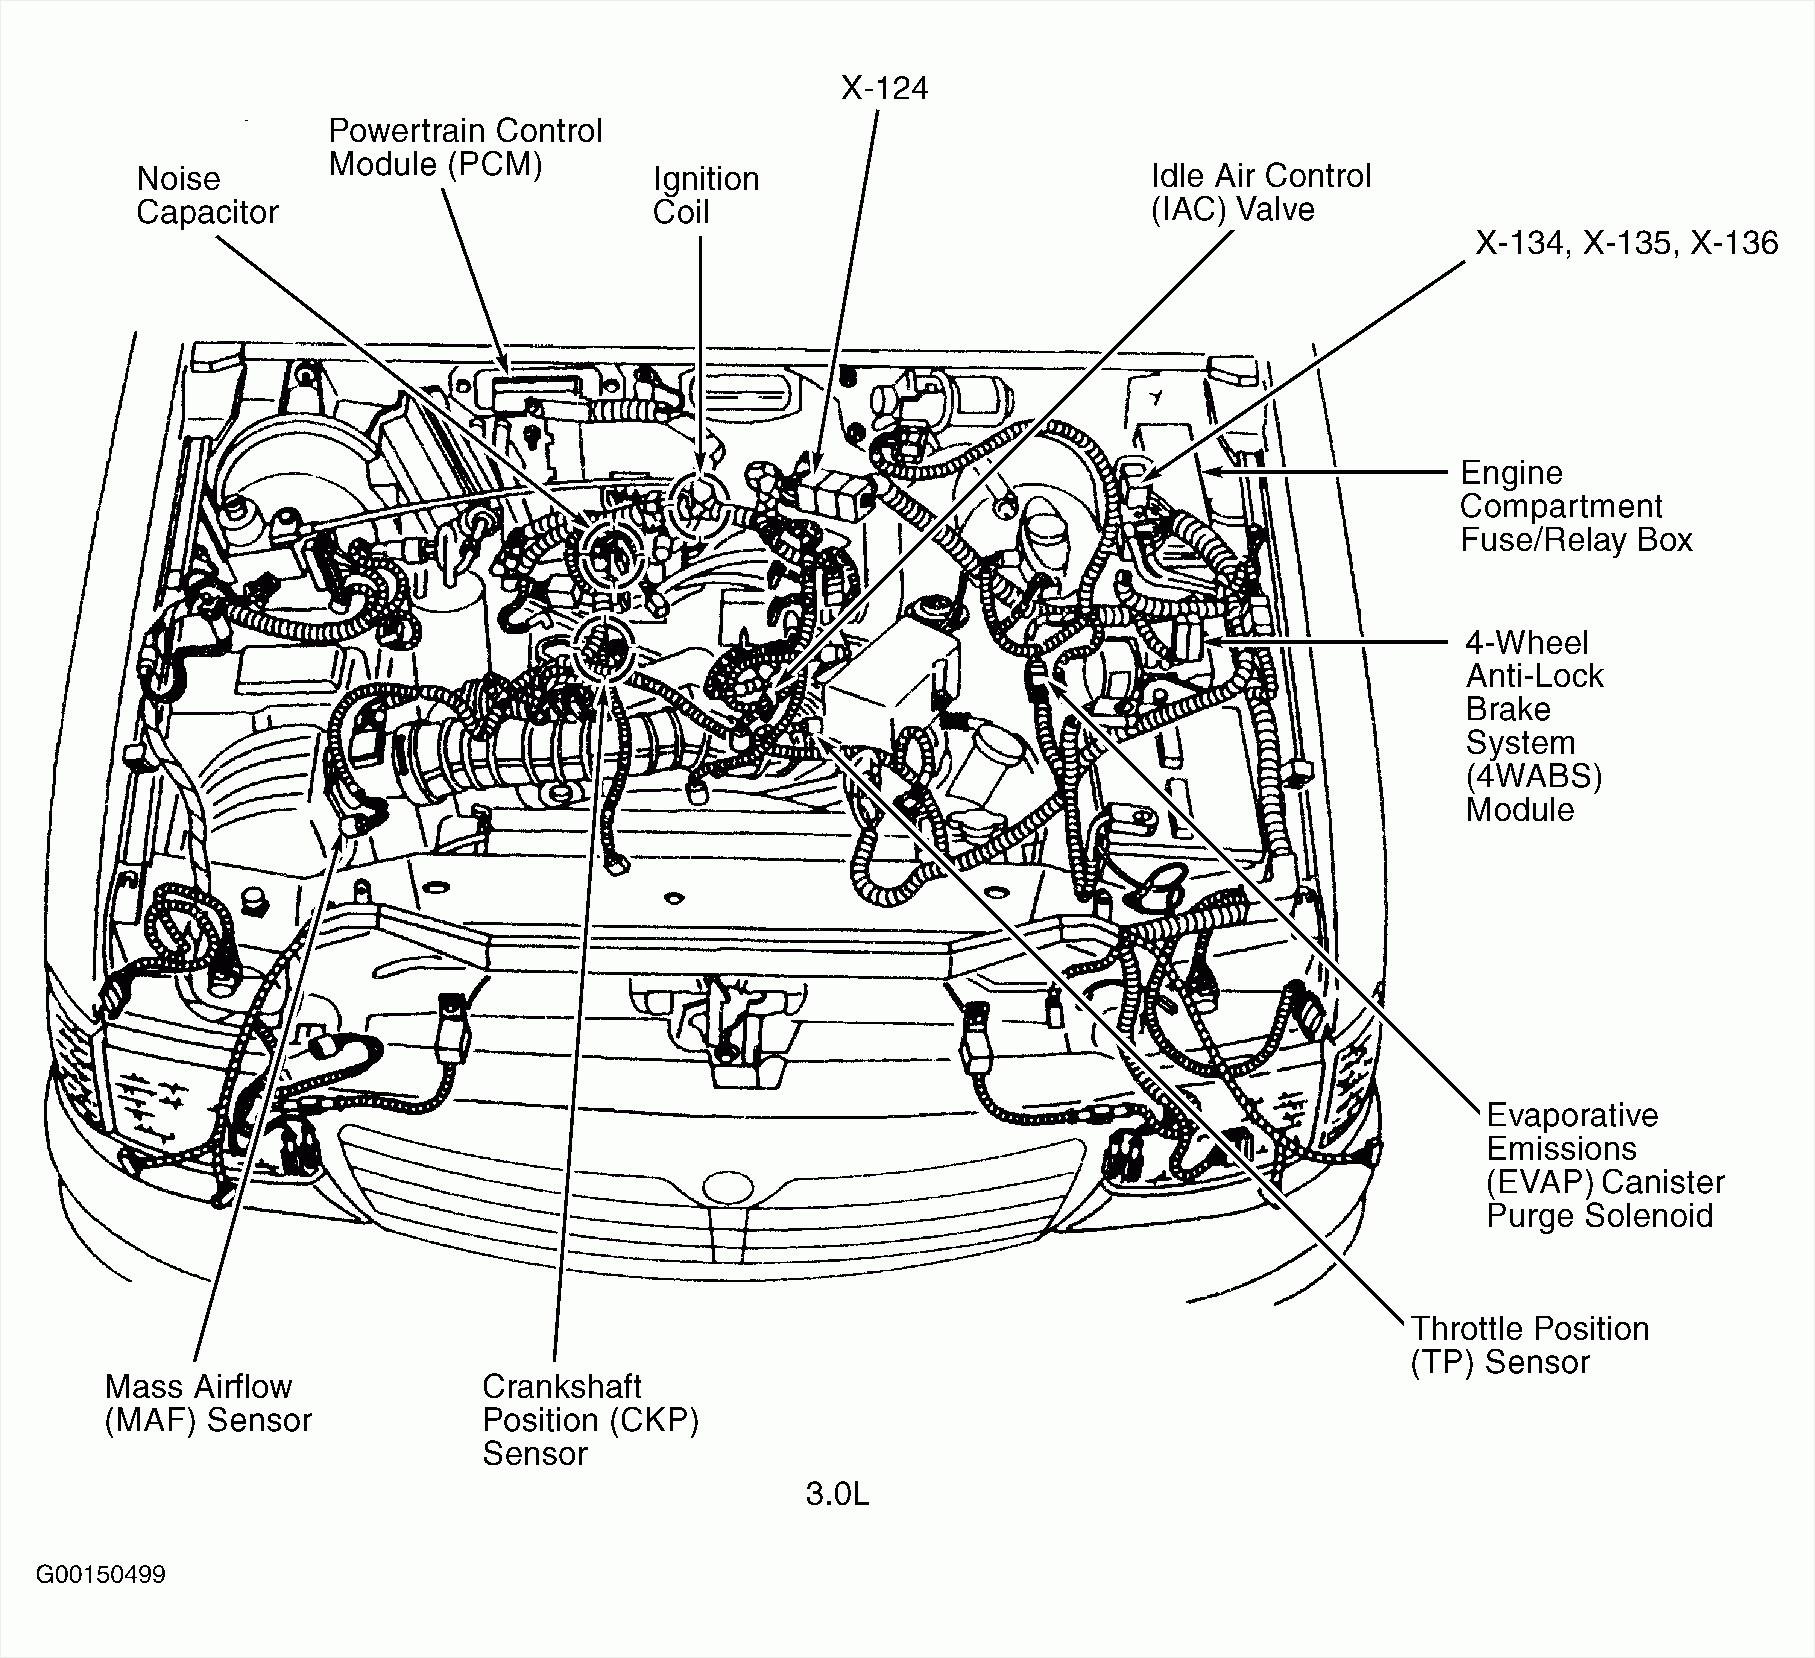 2006 Bmw 325i Engine Diagram | 2004 325i Engine Diagram |  | Fuse Wiring